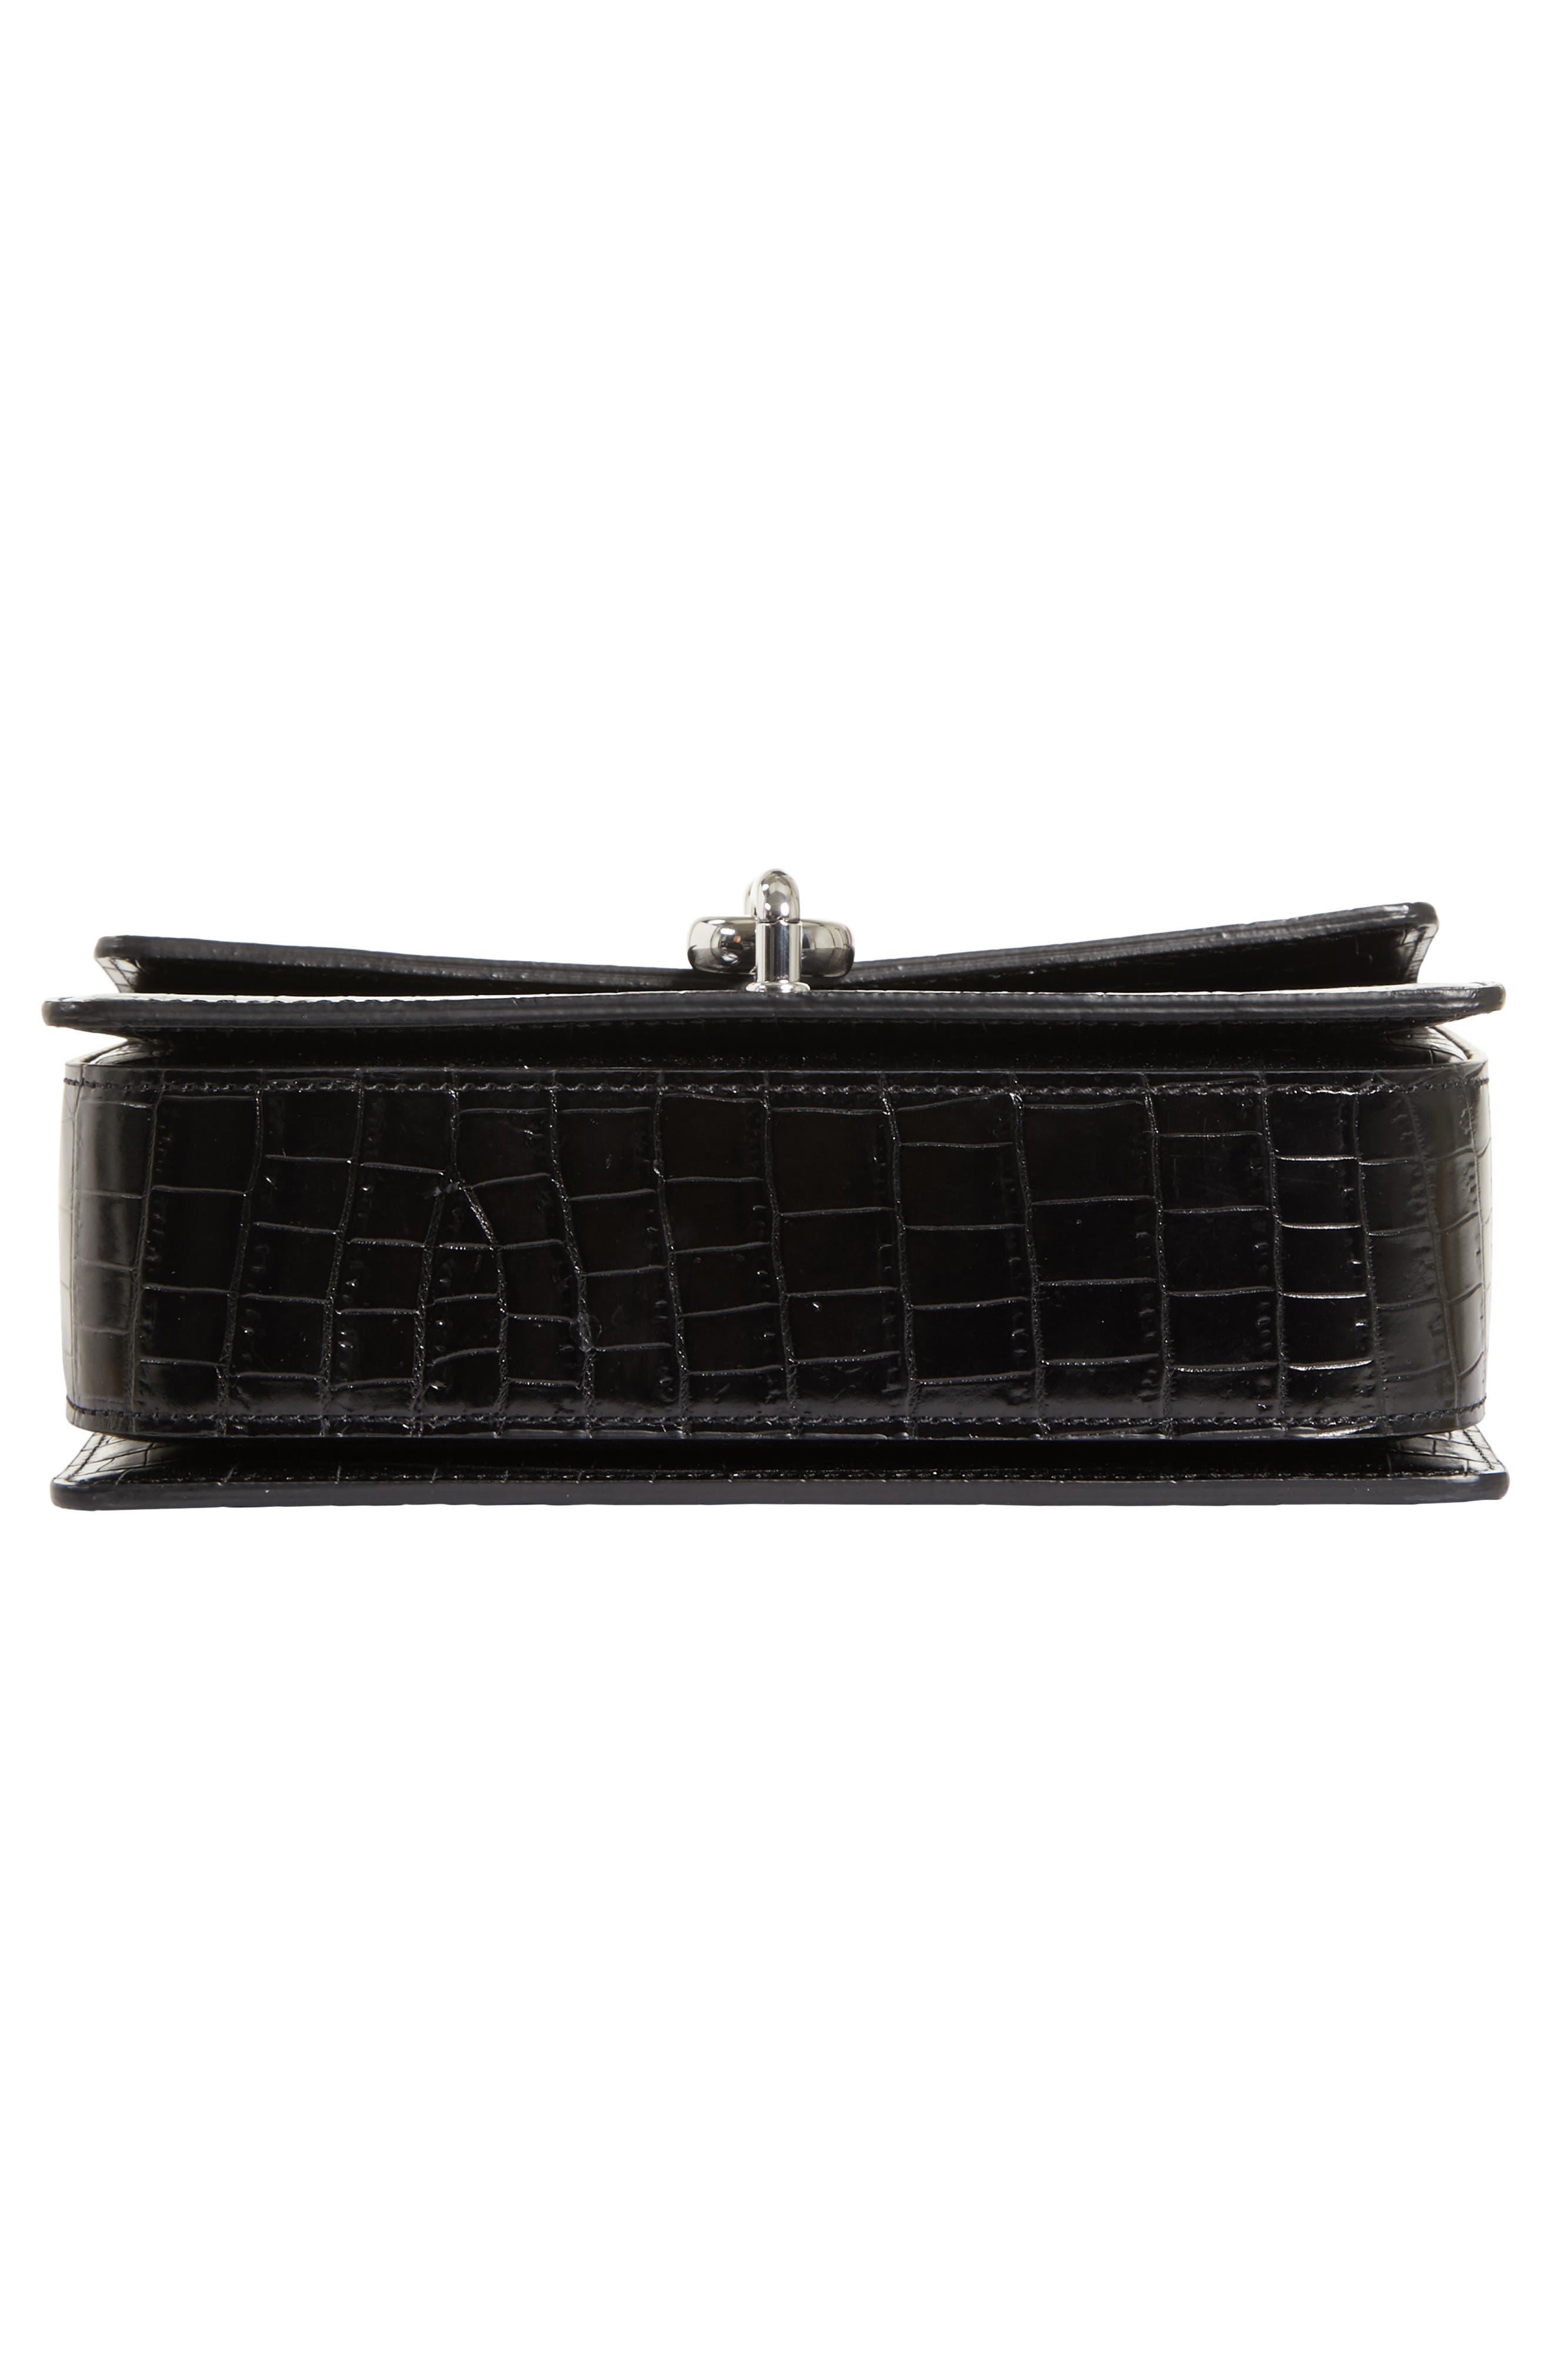 Hook Medium Leather Shoulder/Crossbody Bag,                             Alternate thumbnail 6, color,                             001